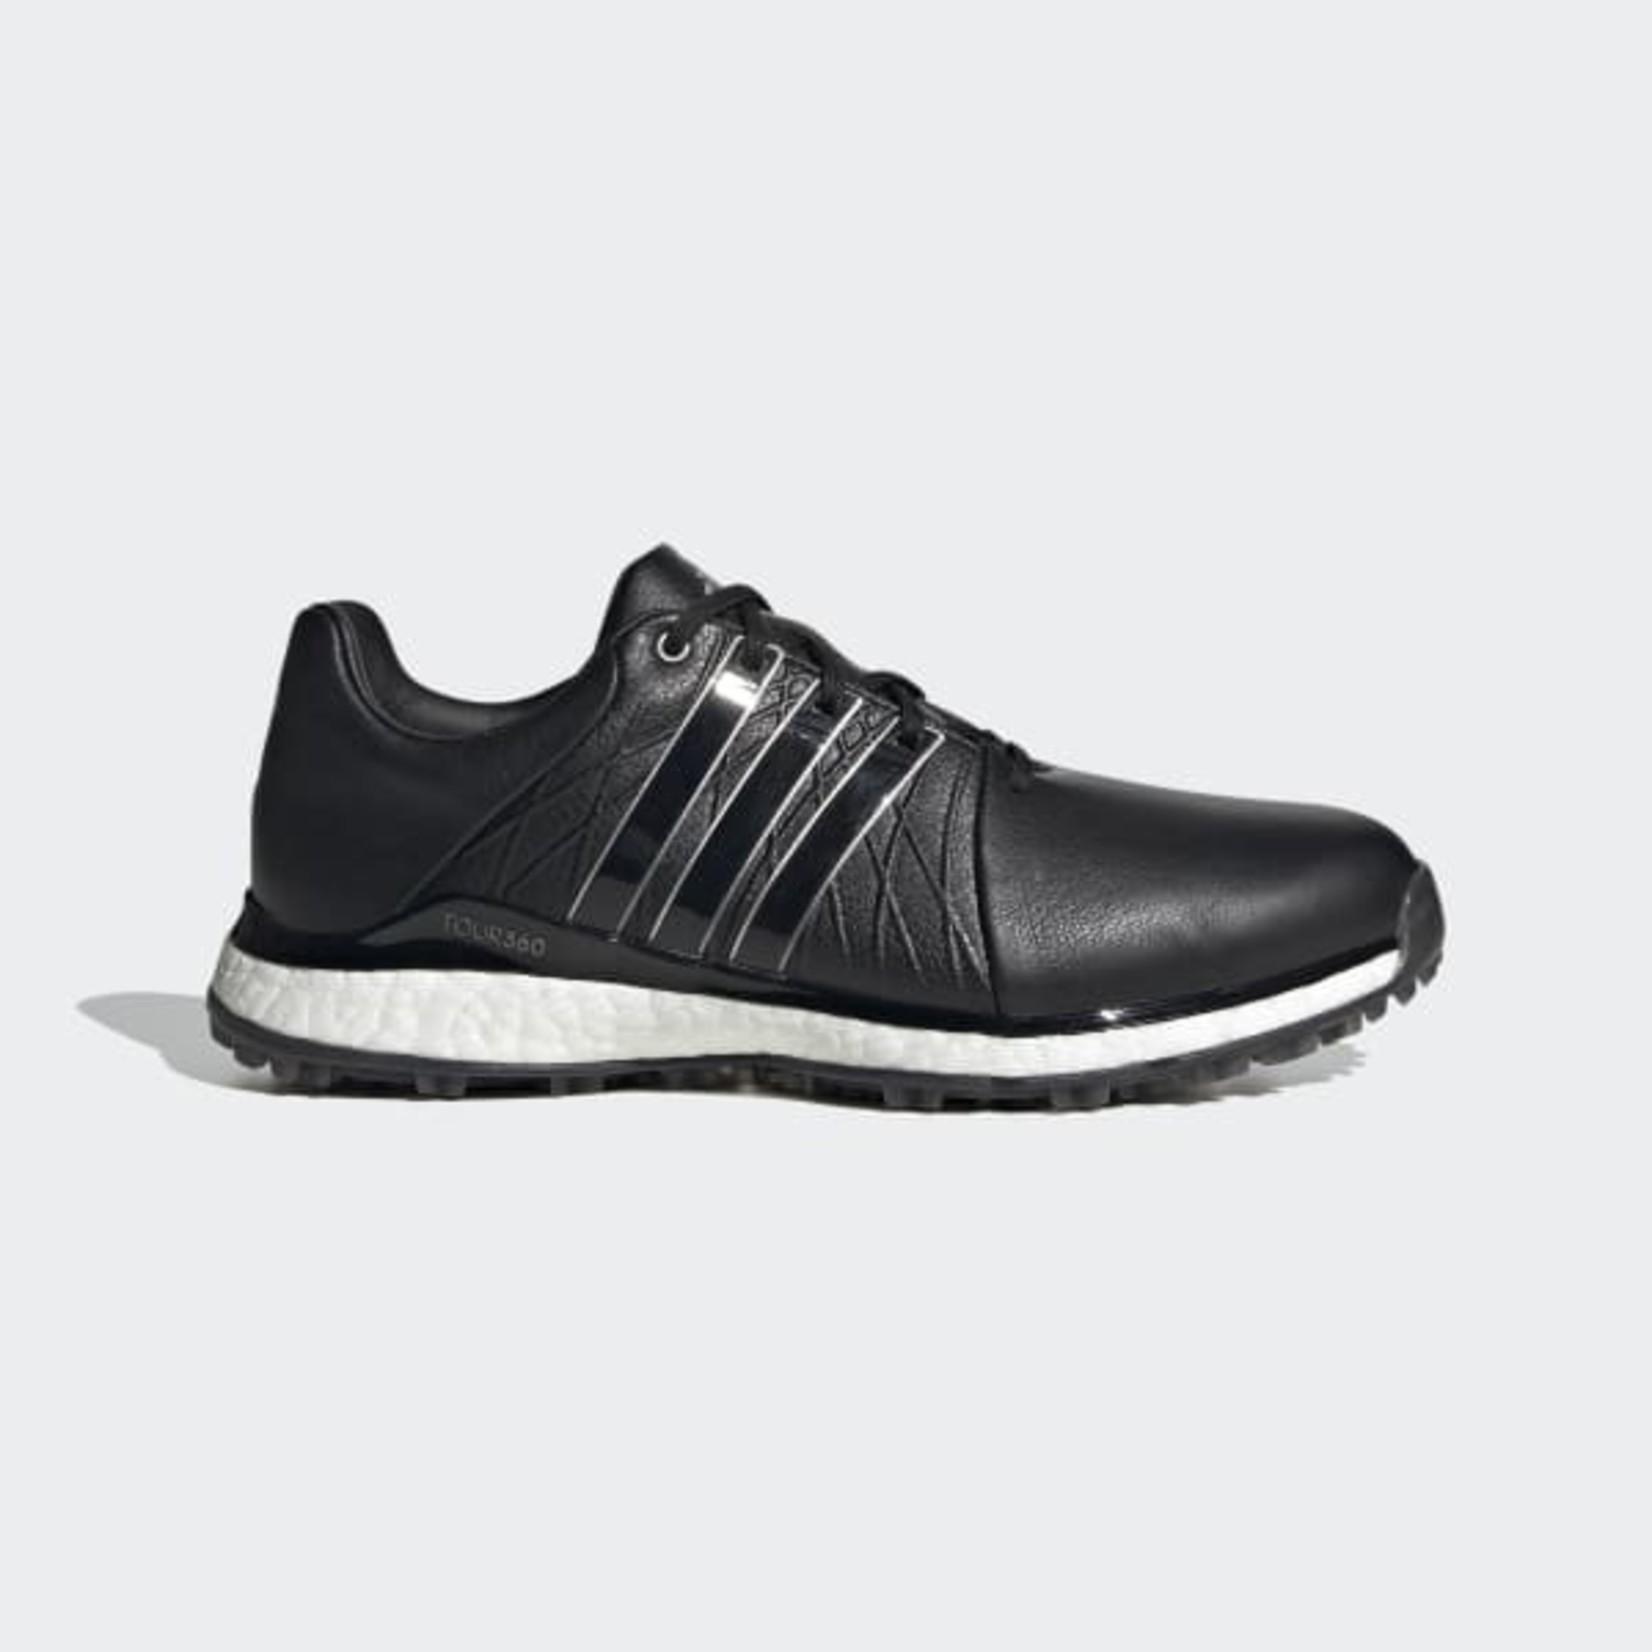 Adidas Adidas W Tour360 XT-SL Black UK 6 / 39 1/2